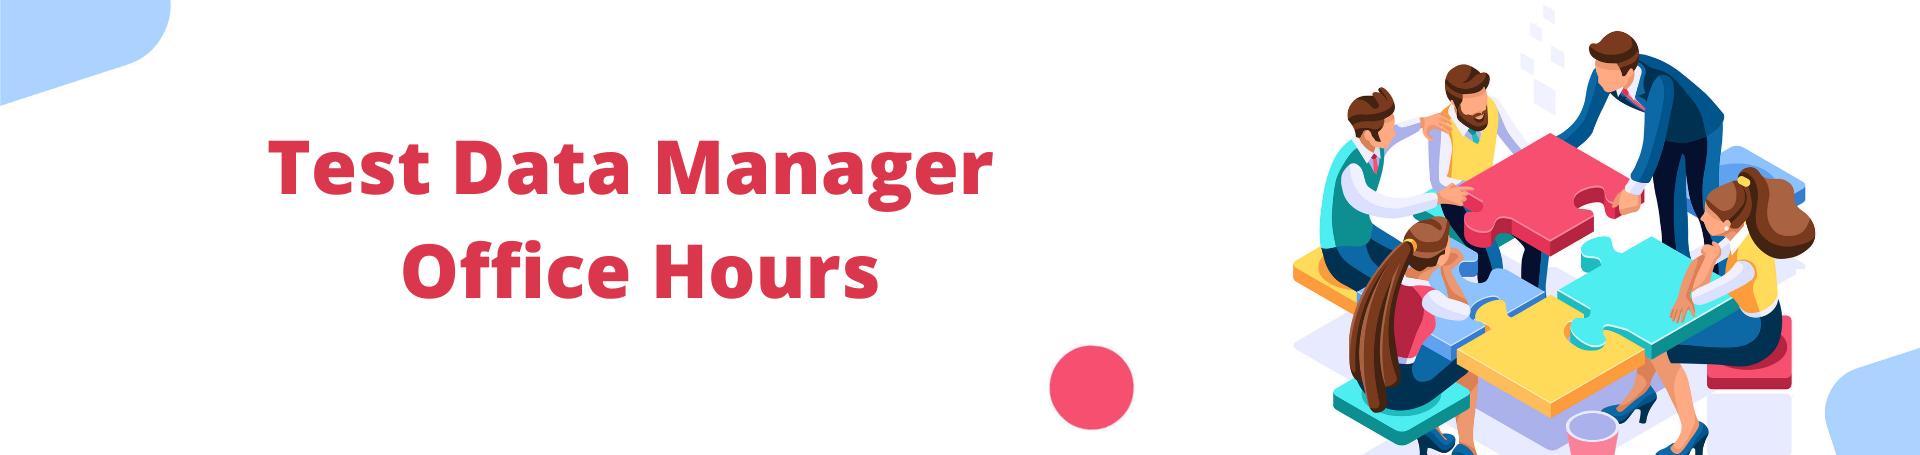 TDM Office Hours Banner